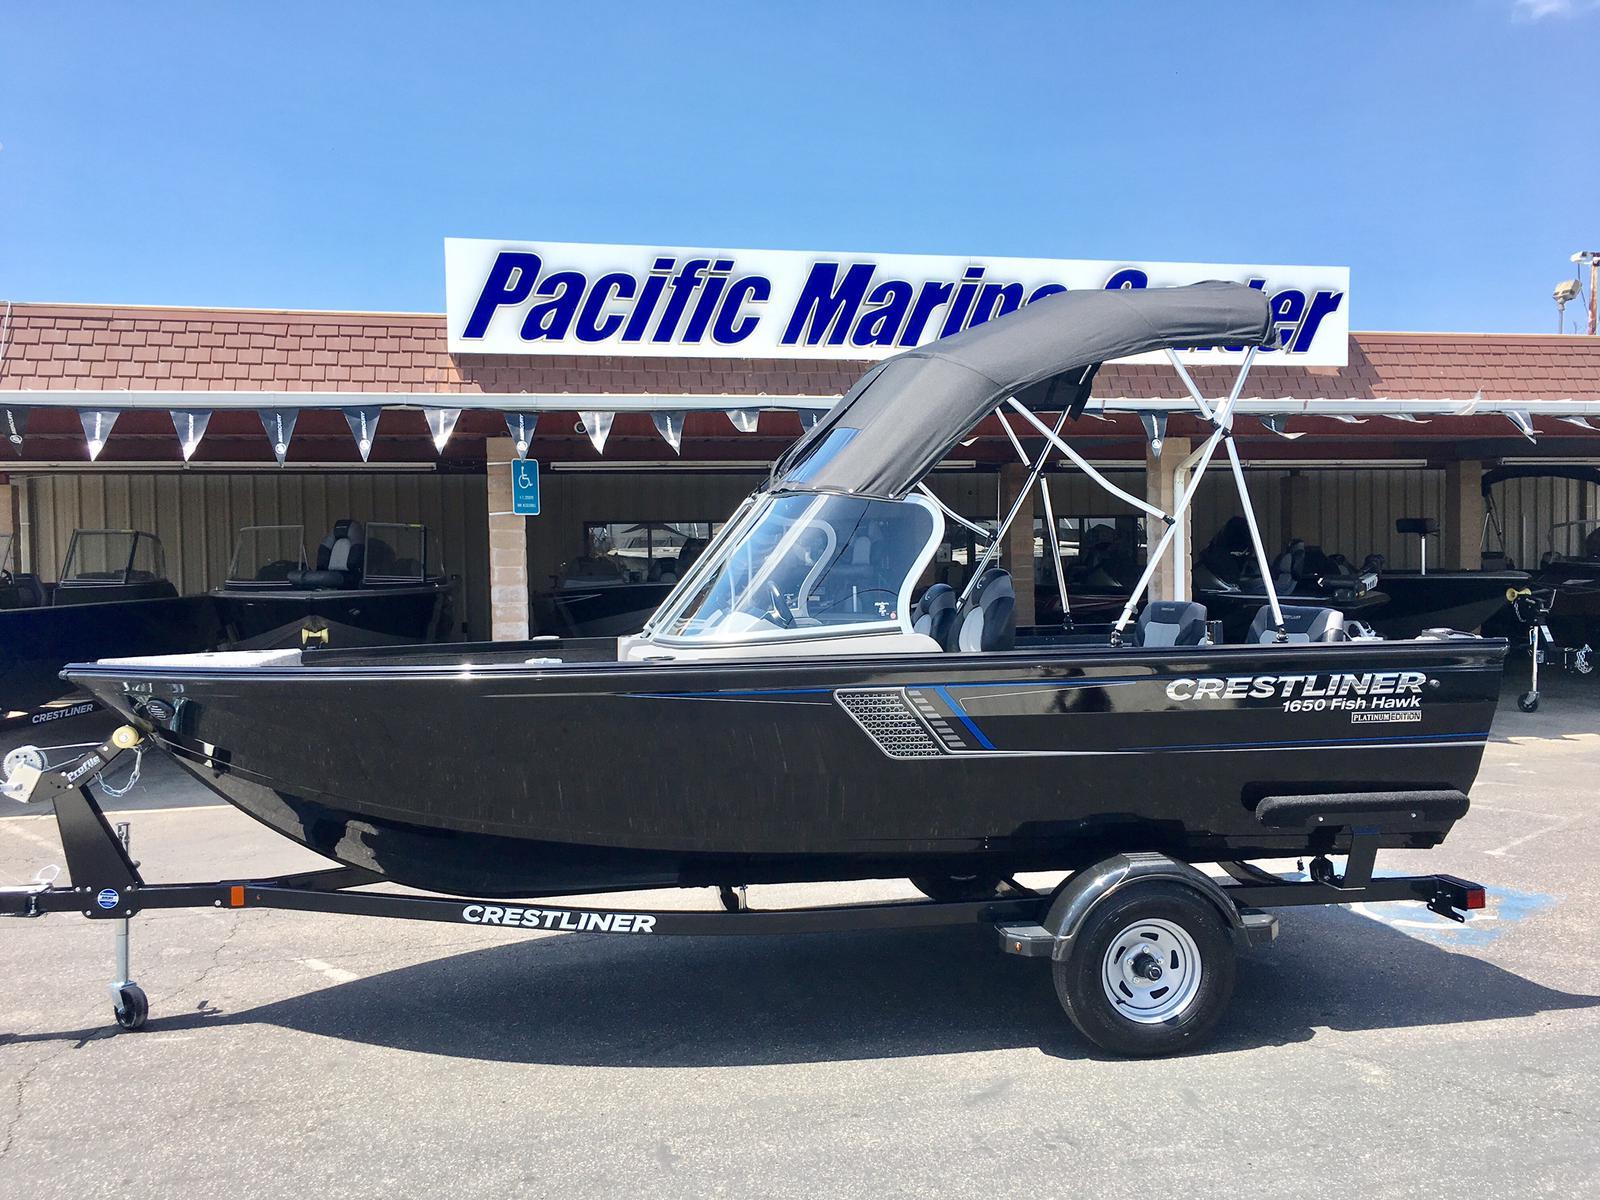 hight resolution of 2018 crestliner 1650 fish hawk wt mercury 60hp for sale in madera ca